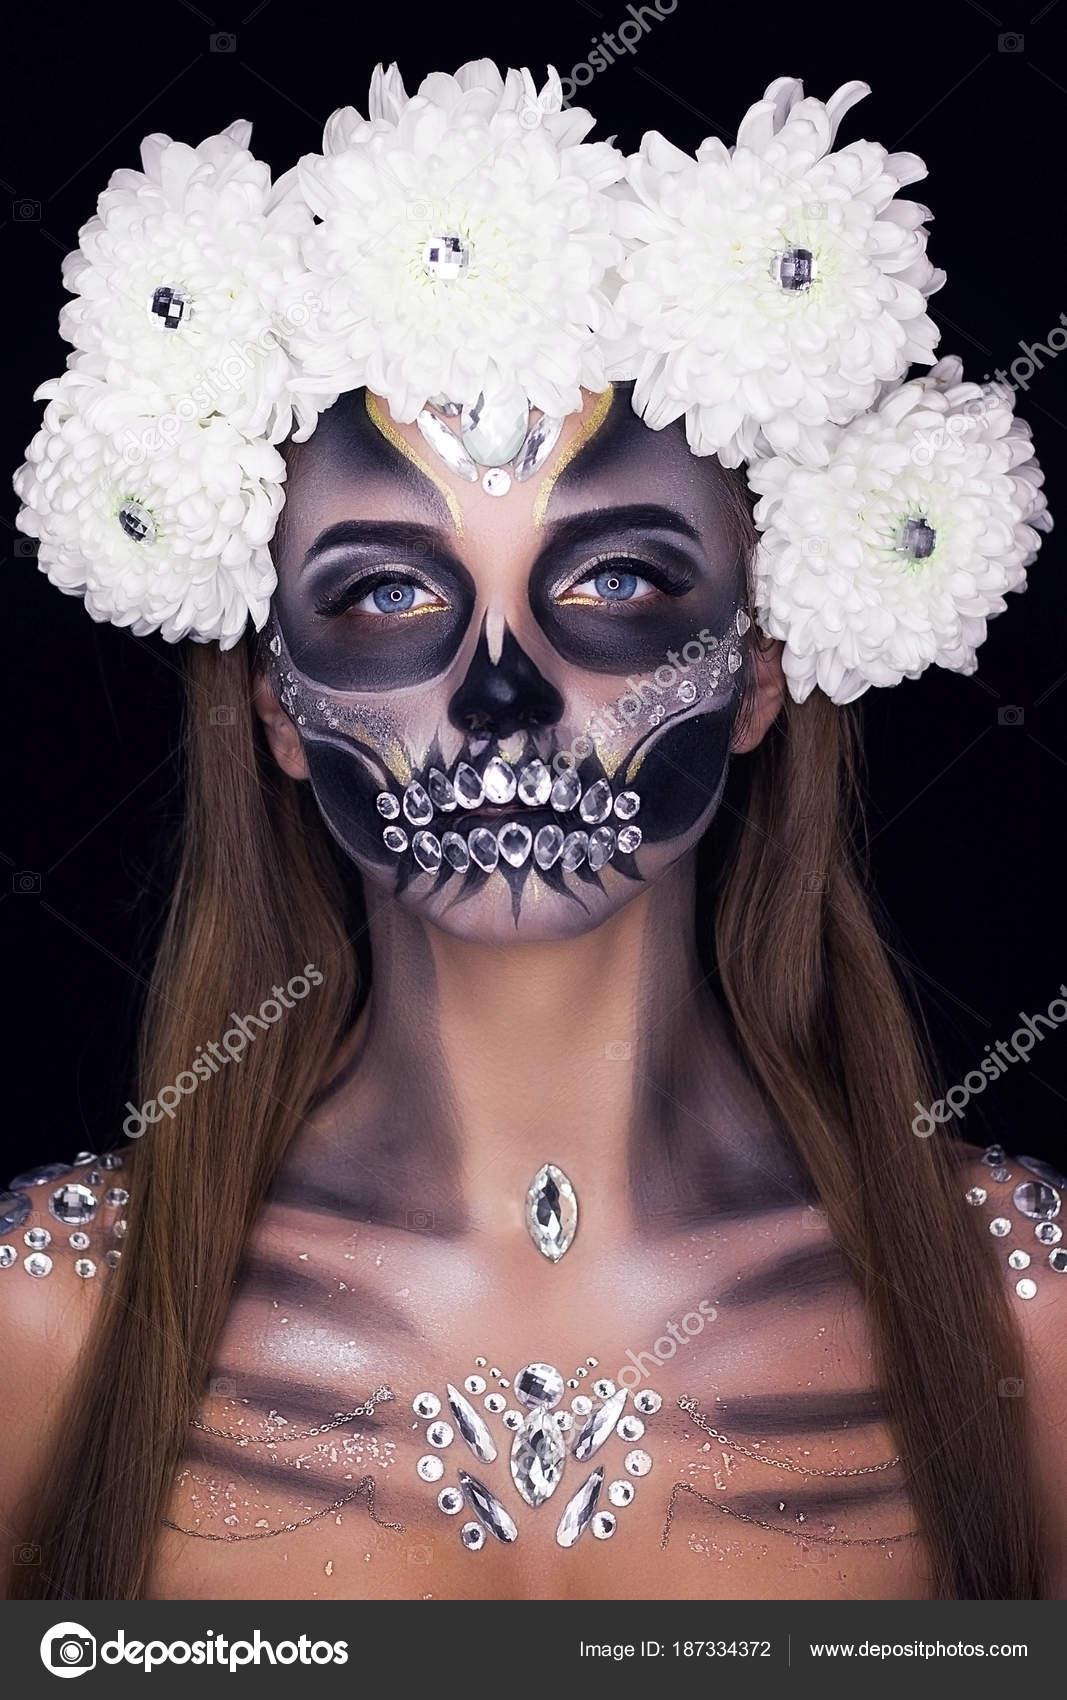 Maquillaje Profesional Para Halloween Foto De Stock C Kirilyukrm - Maquillaje-profesional-halloween